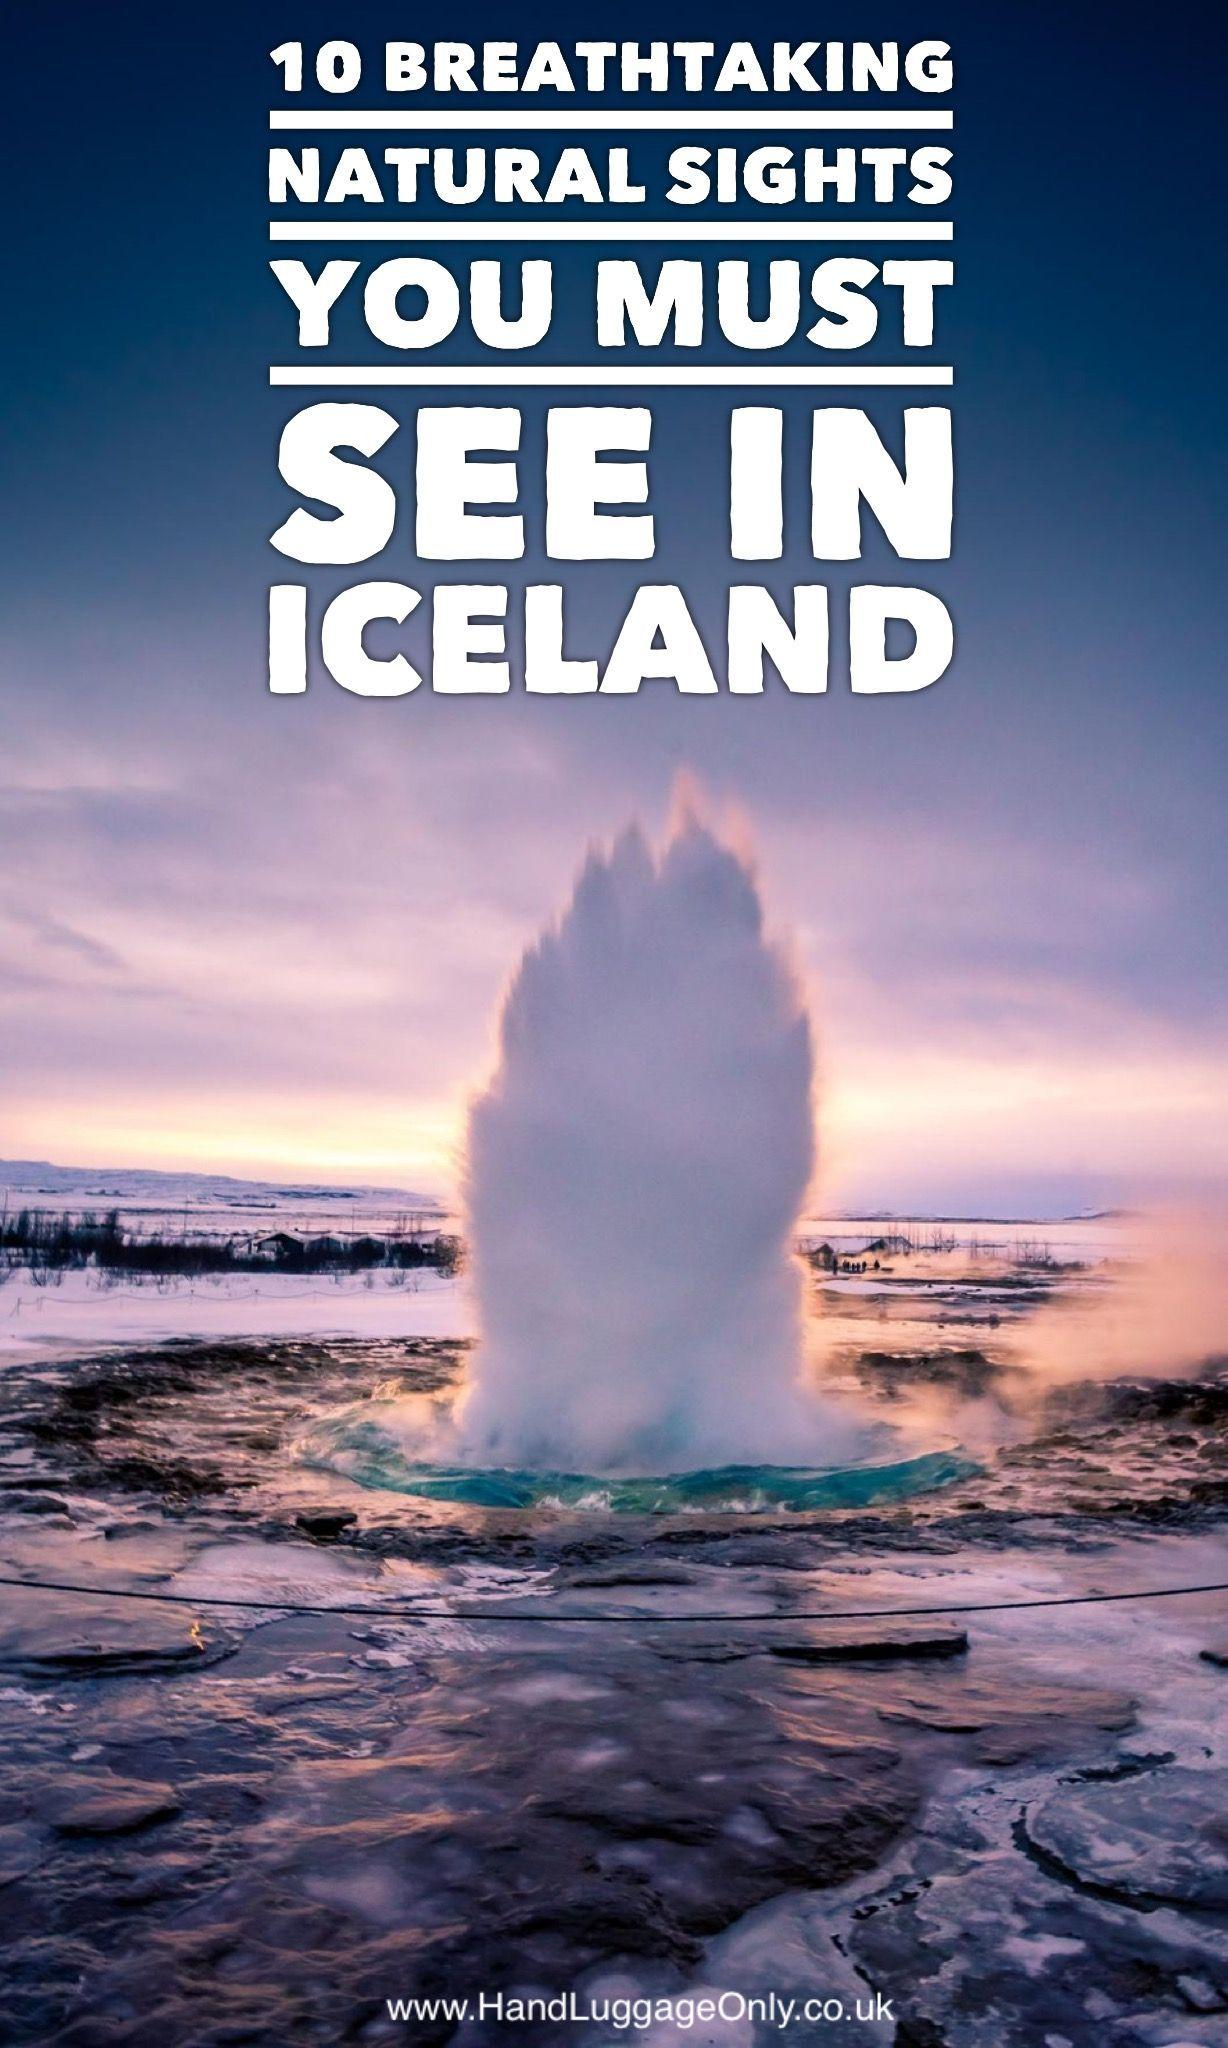 Breathtaking Natural Sights You'll Want To Explore In Iceland 10 Breathtaking Natural Sights You'll Want To Explore In Iceland - Hand Luggage Only - Travel, Food & Photography Blog10 Breathtaking Natural Sights You'll Want To Explore In Iceland - Hand Luggage Only - Travel, Food & Photography Blog